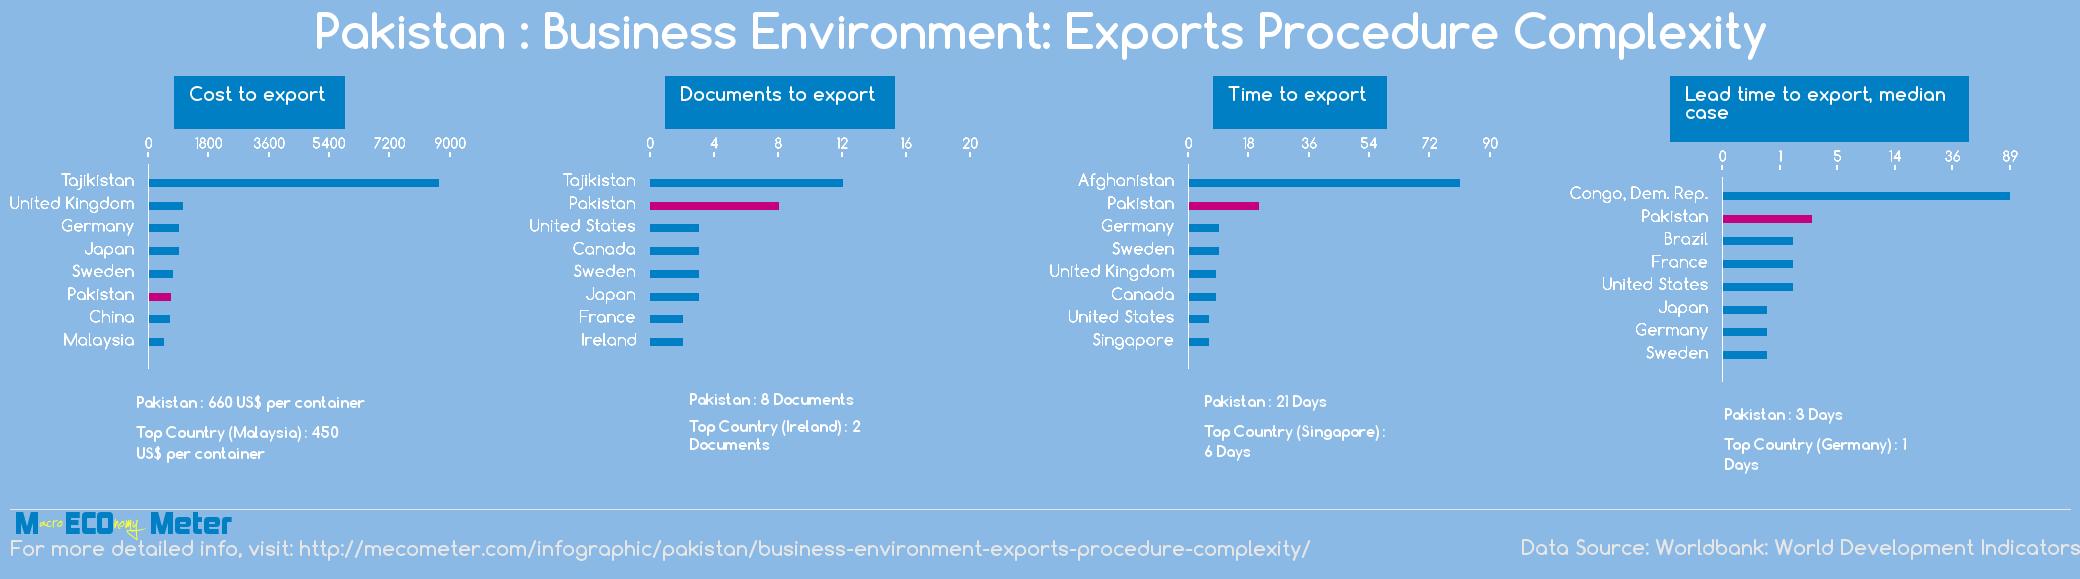 Pakistan : Business Environment: Exports Procedure Complexity